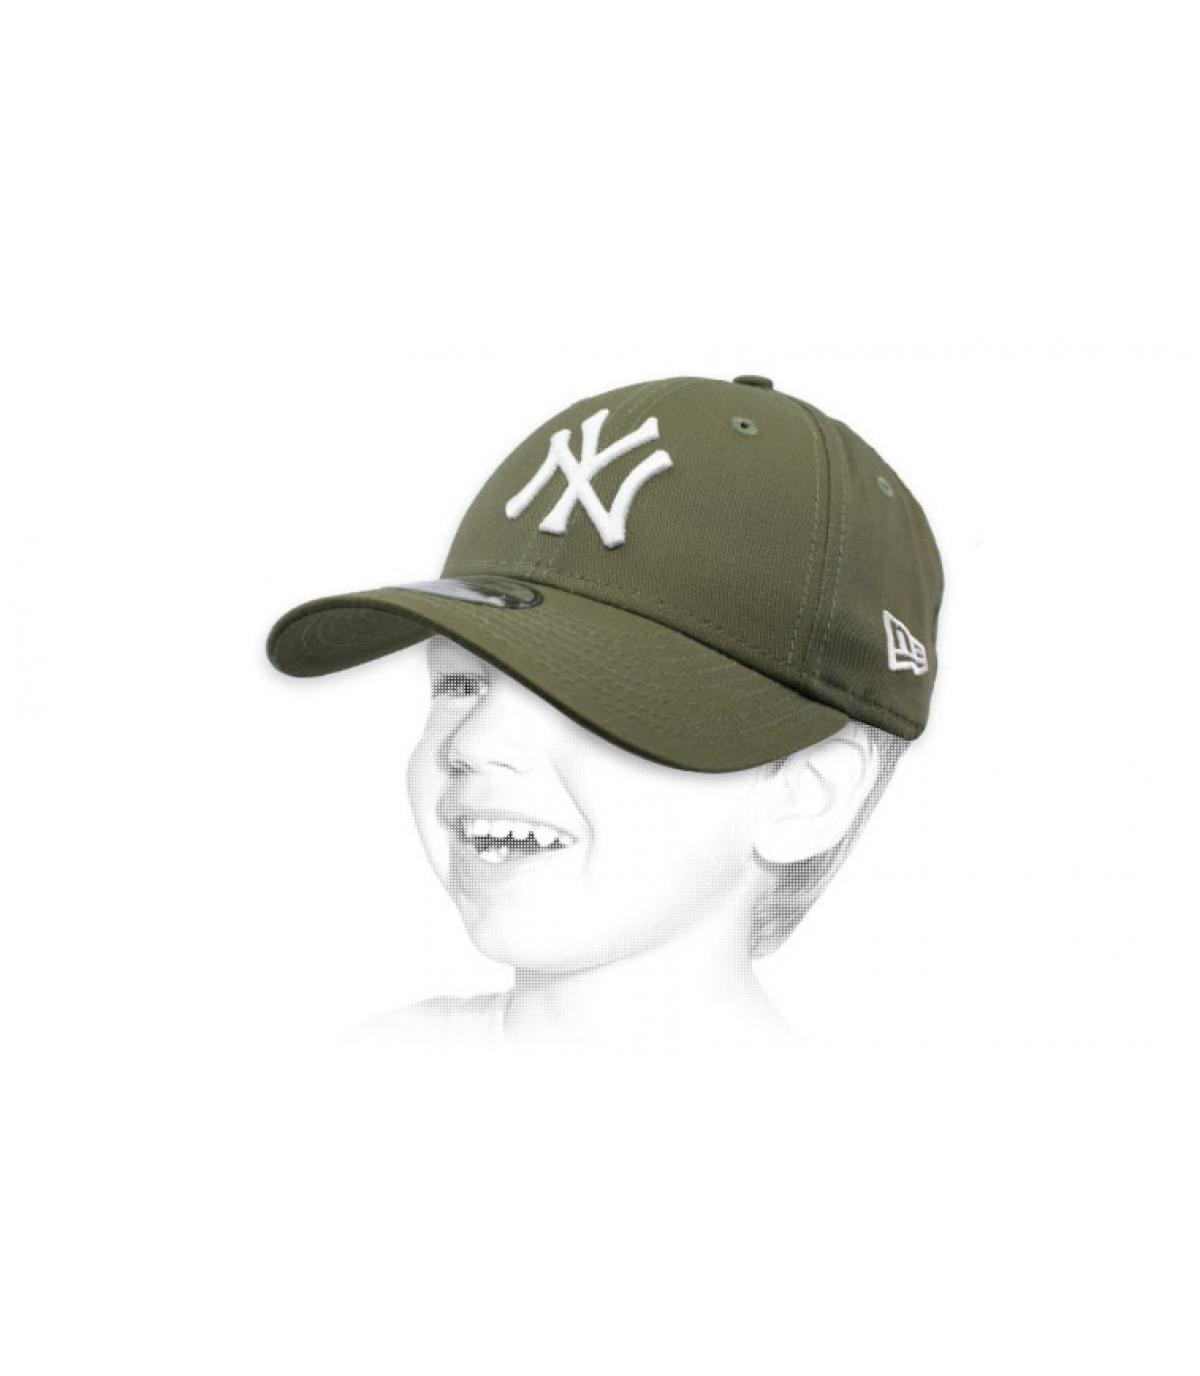 NY berretto bambino verde